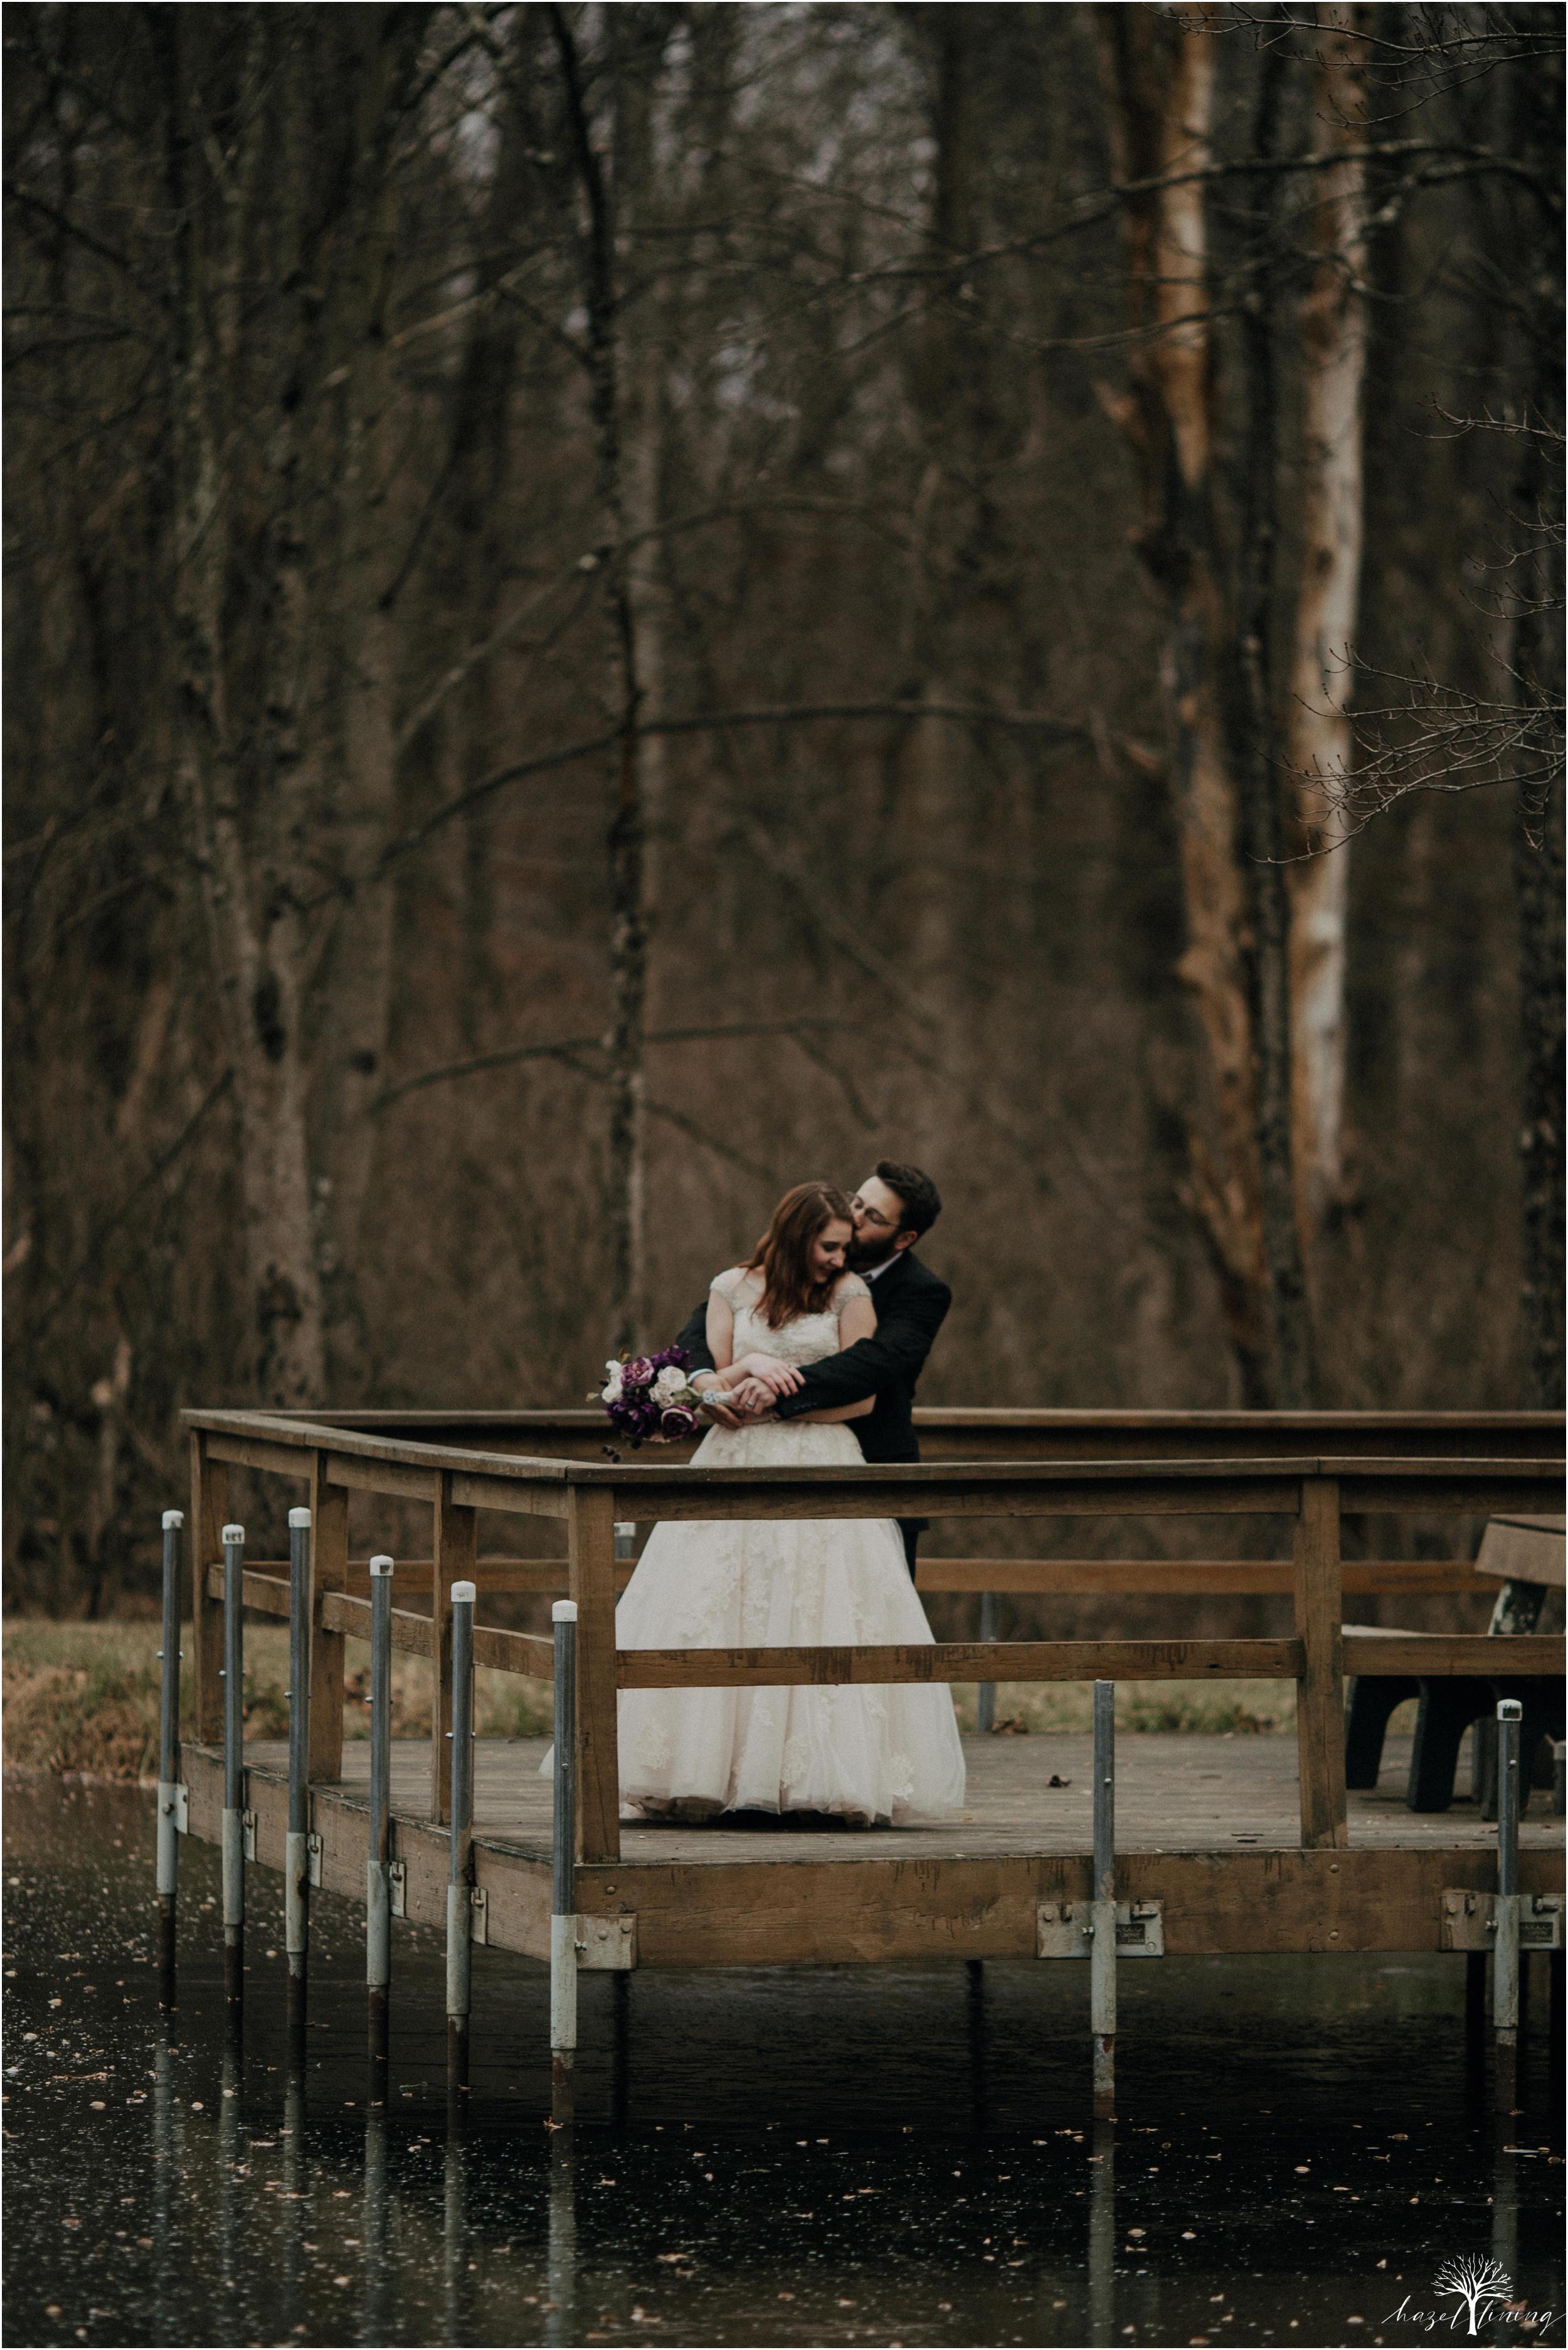 evan-maggie-lesh-one-year-anniversary-winter-shoot-camp-menolan-pennsylvania_0070.jpg